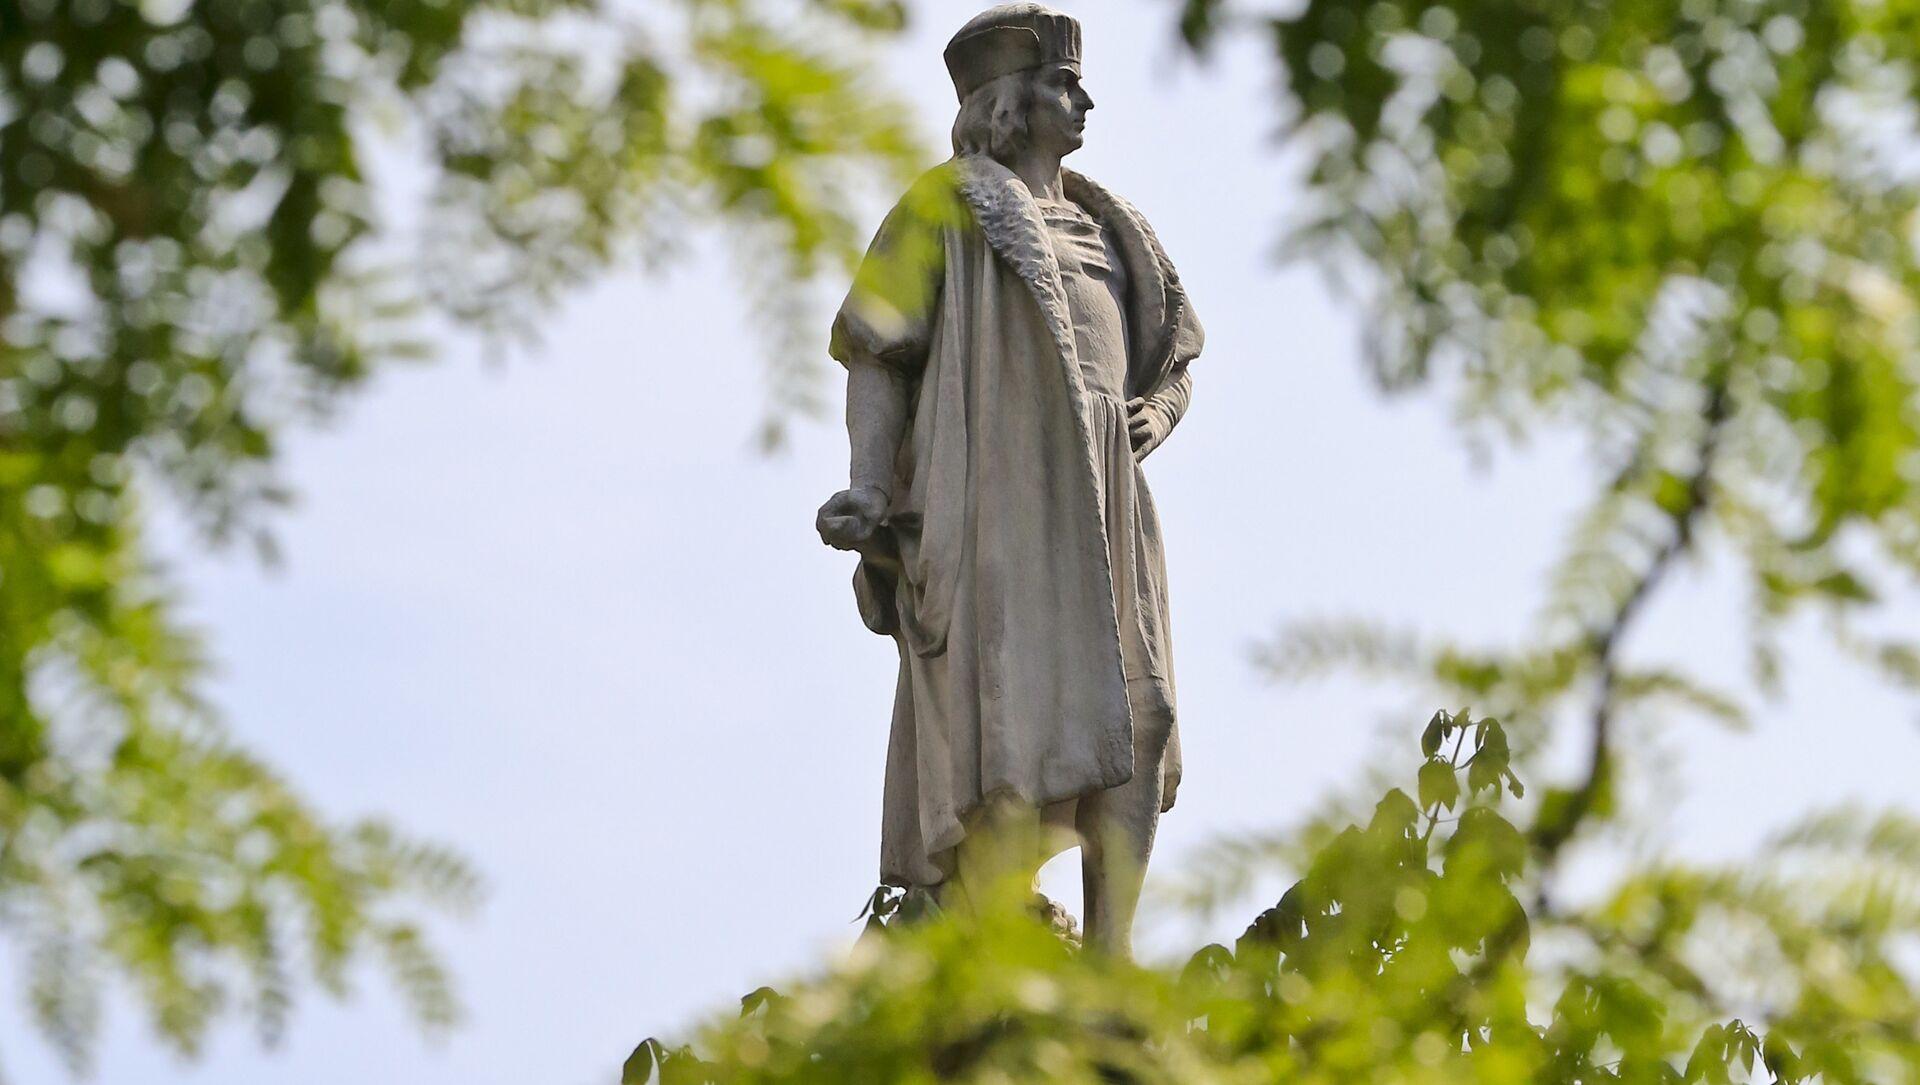 Statue de Christophe Colomb à New York - Sputnik France, 1920, 06.09.2021